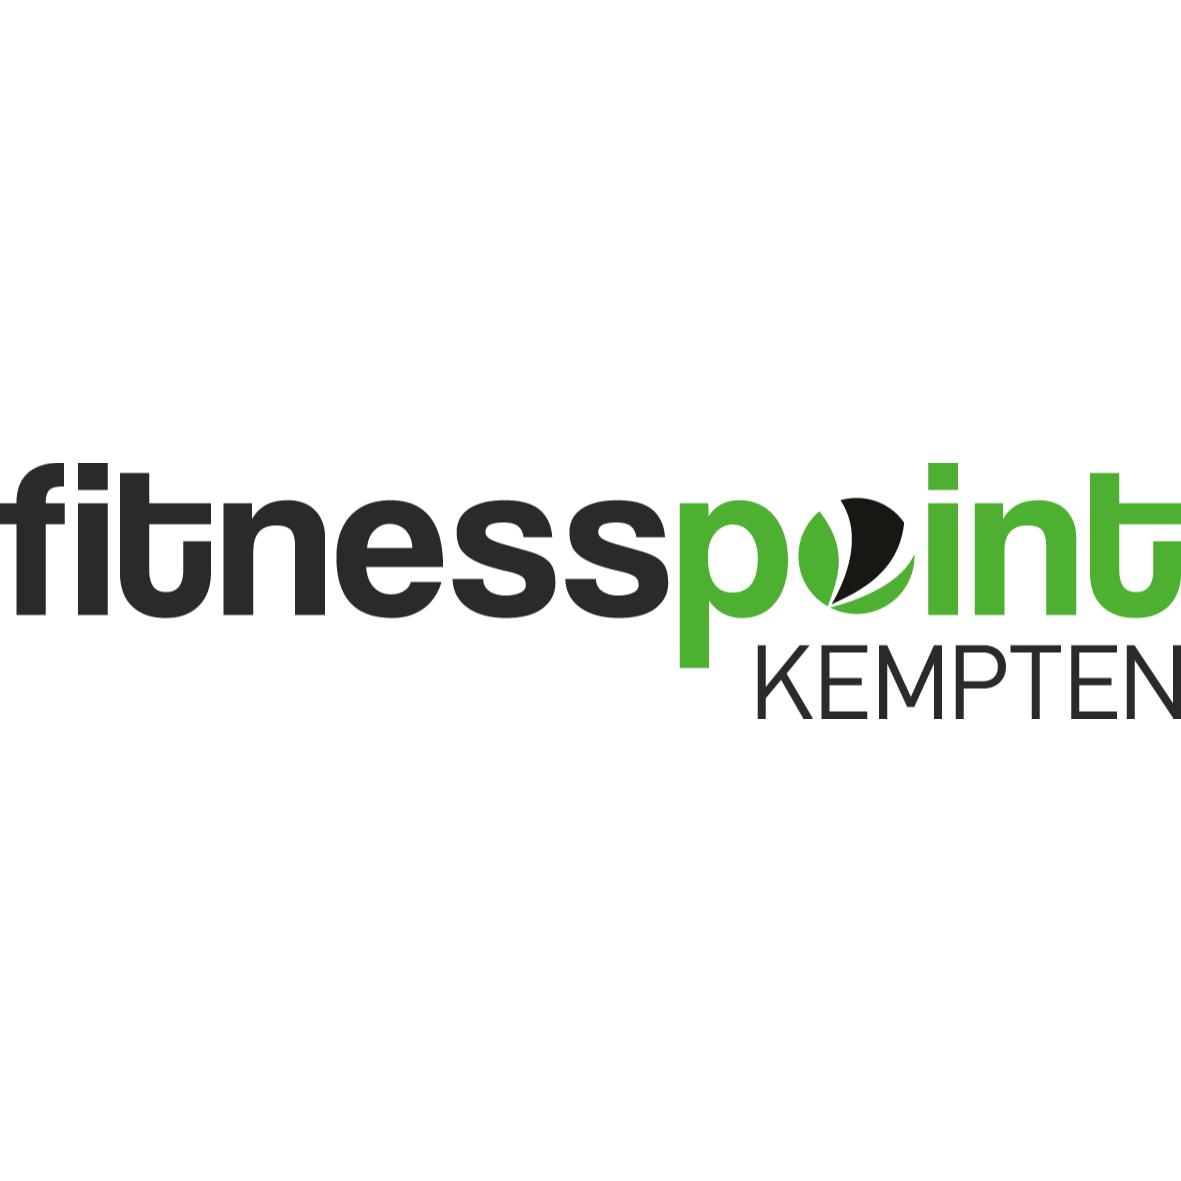 Bild zu Fitnesspoint Kempten in Kempten im Allgäu